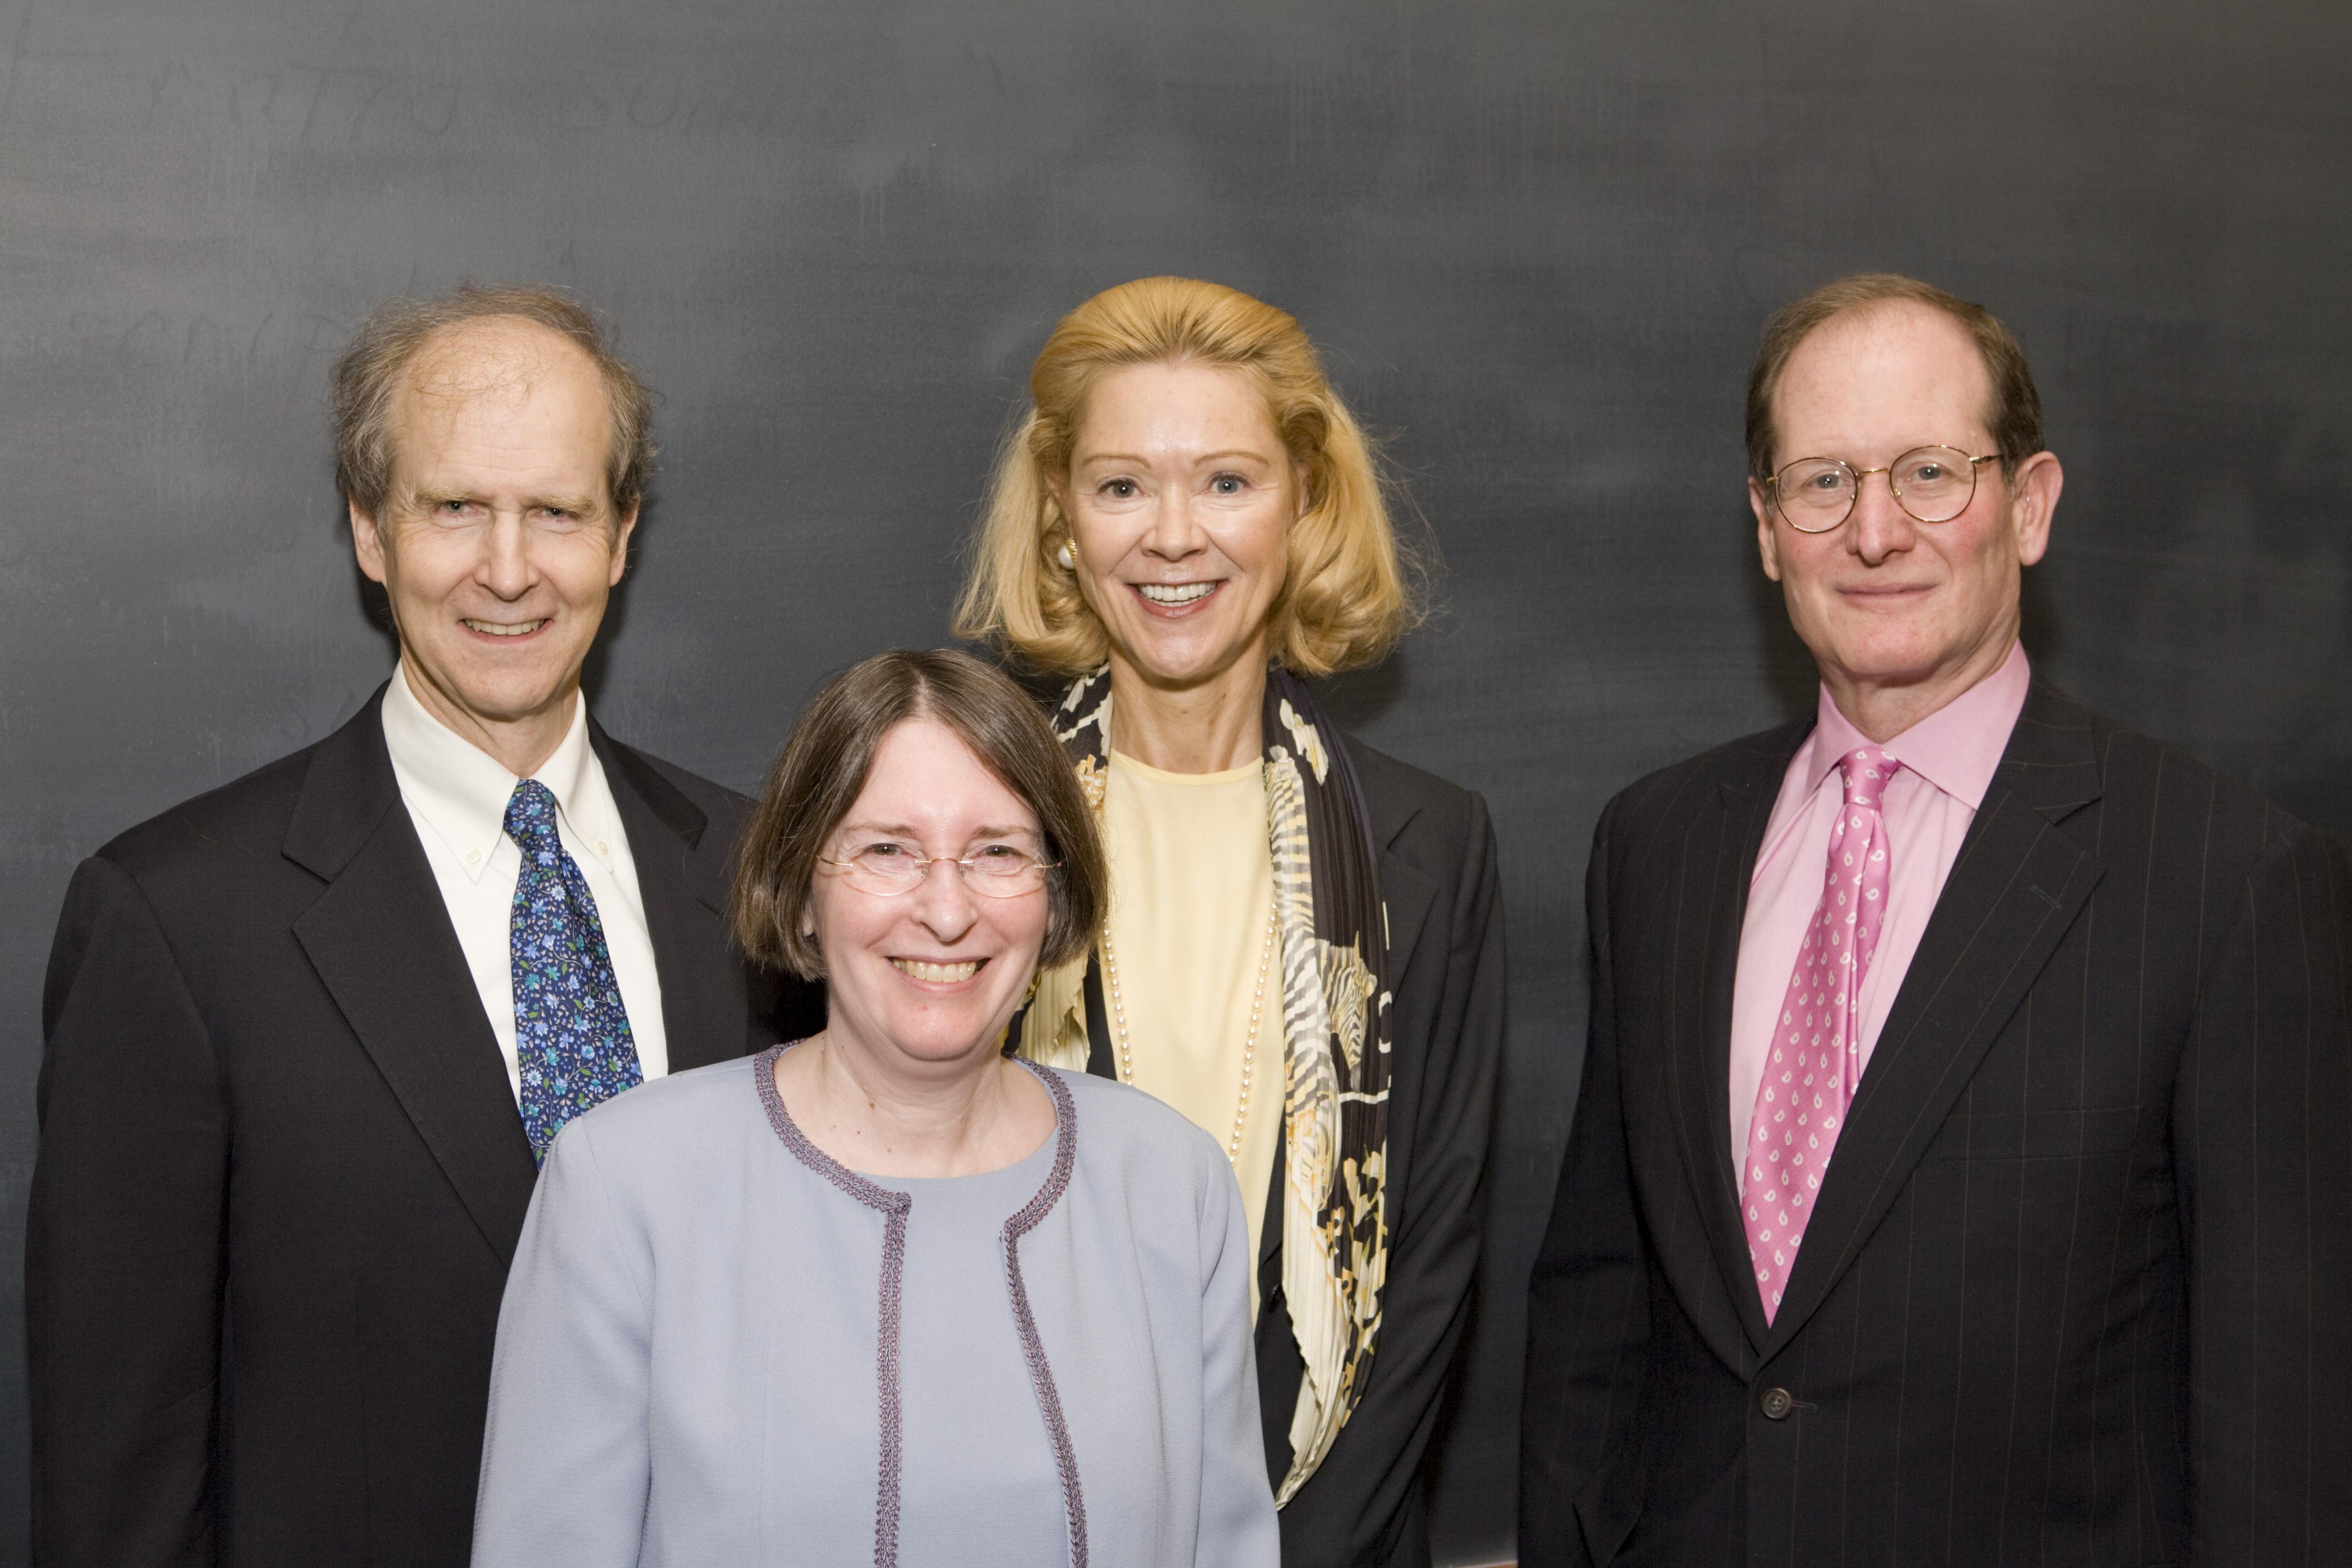 William McDavid '72, YLS Prof. and Center Dir. Roberta Romano '80, Siri Marshall '74, and Ben Heineman '71